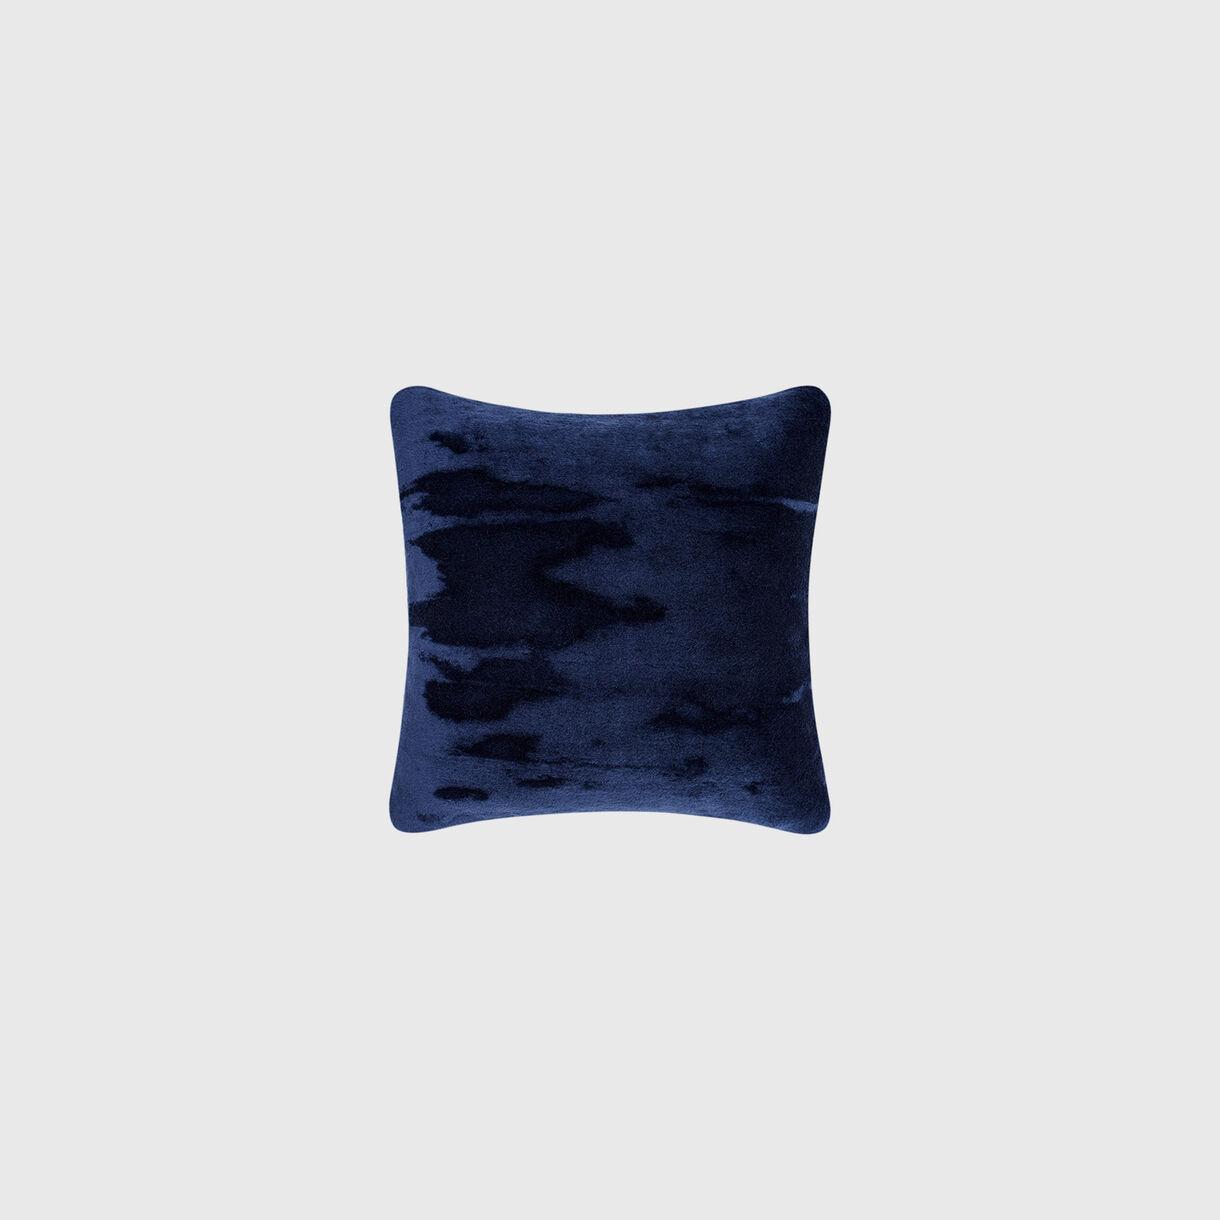 Soft Cushion, Blue